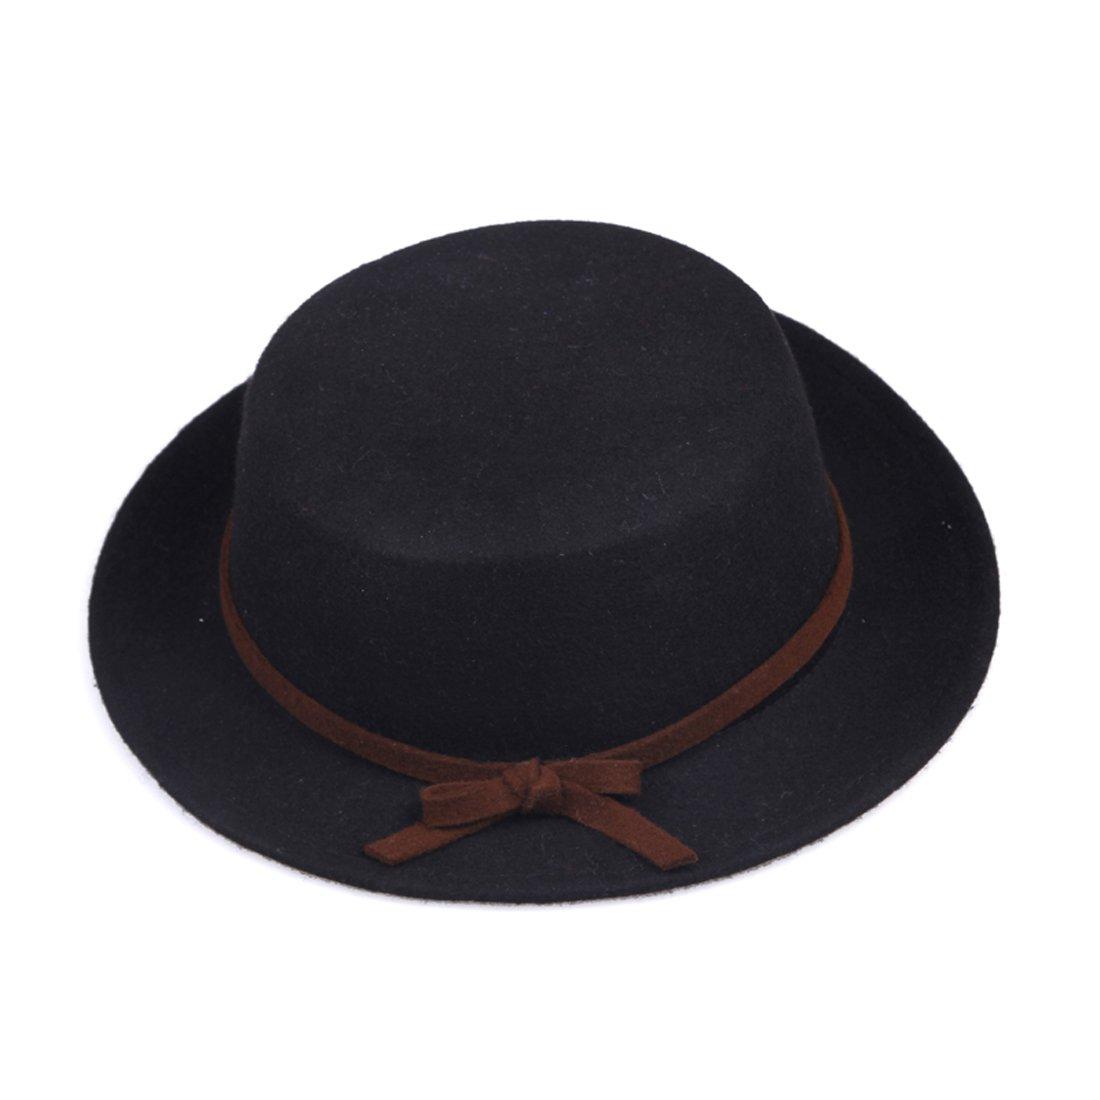 JTC Wool Bowler Flat Hat Bucket Cap Bowknot Short Brim Derby 1pcs